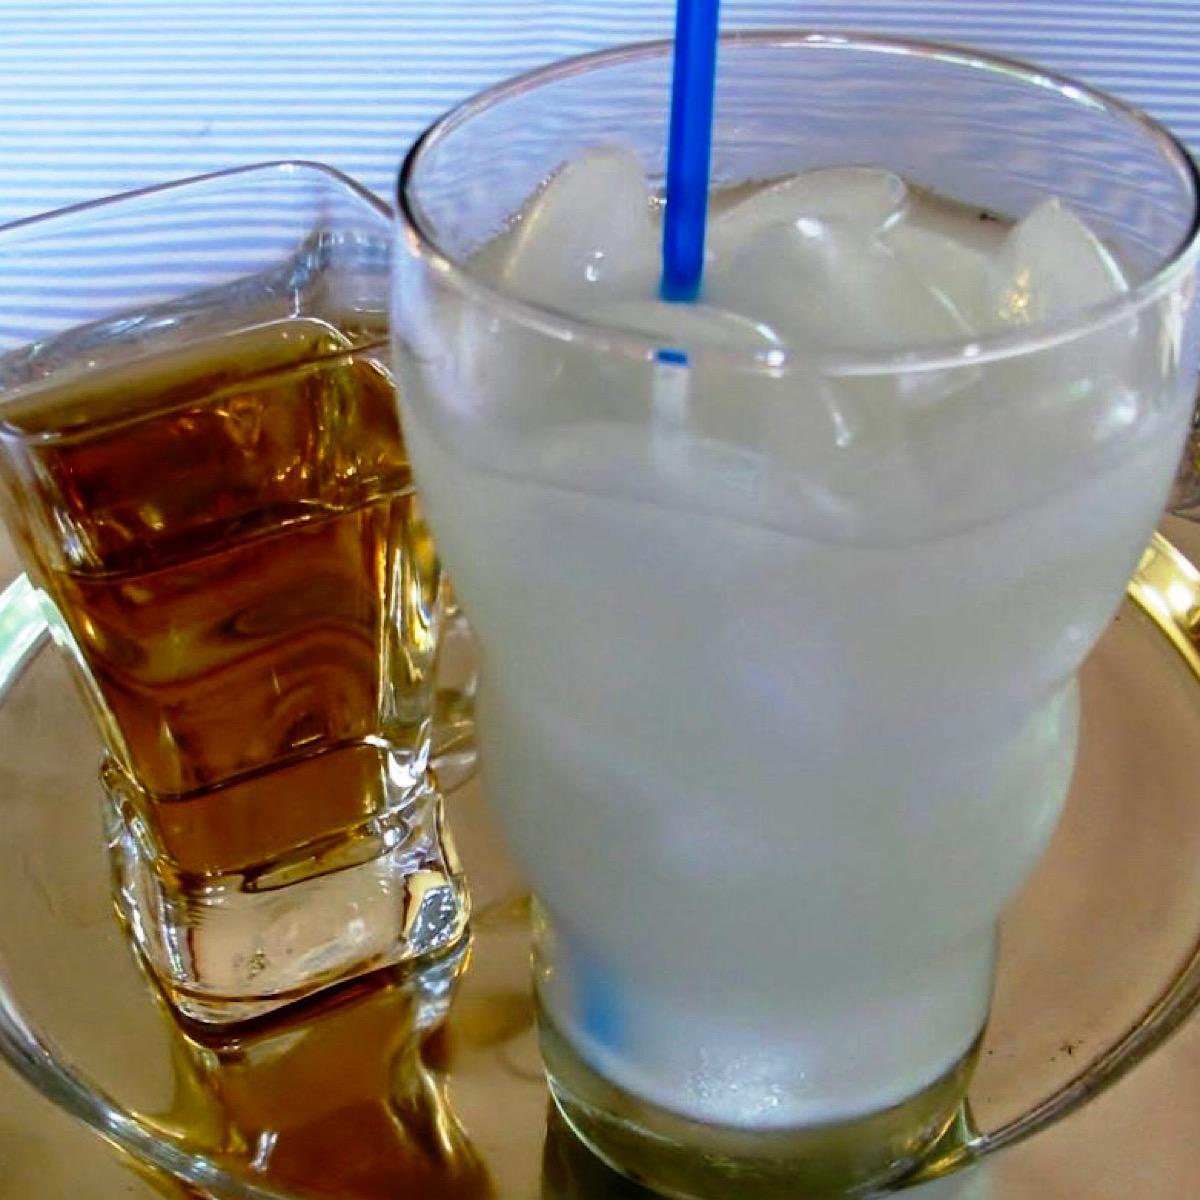 DIY horchata drink with cinnamon-vanilla simple syrup